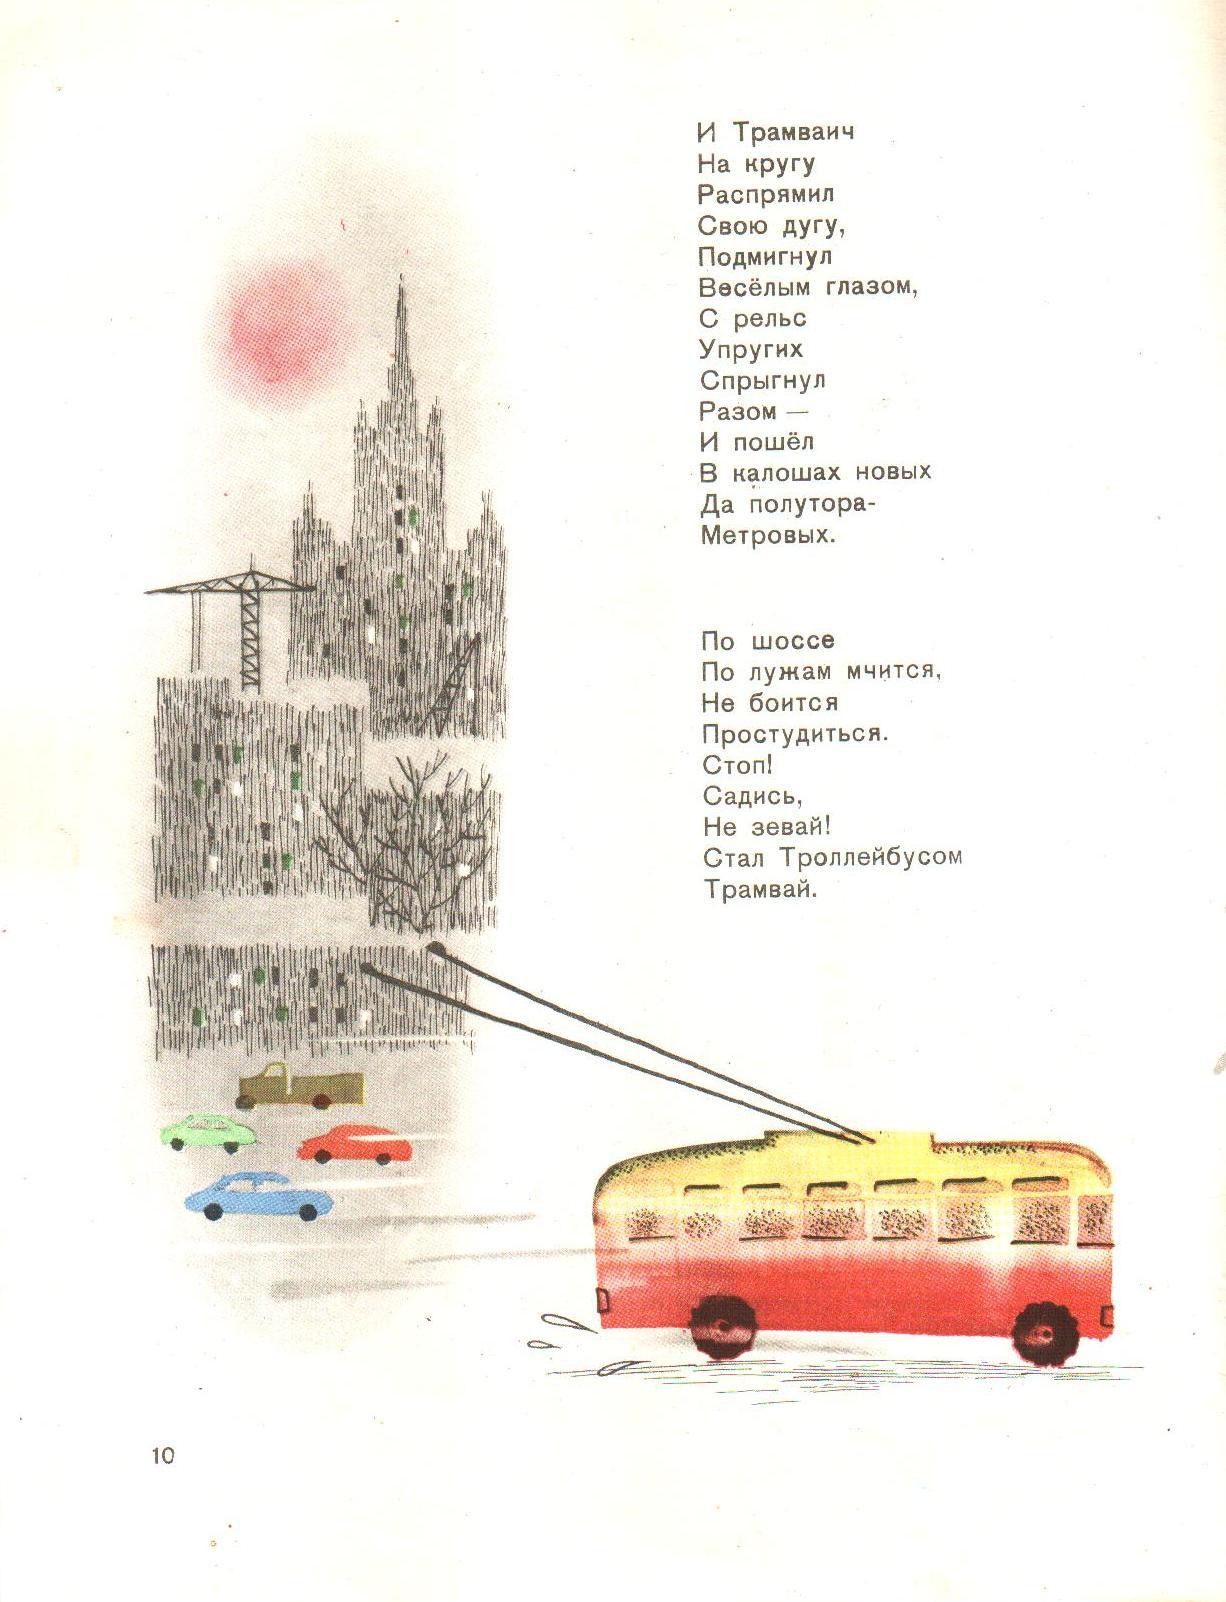 Трамвай трамваич11